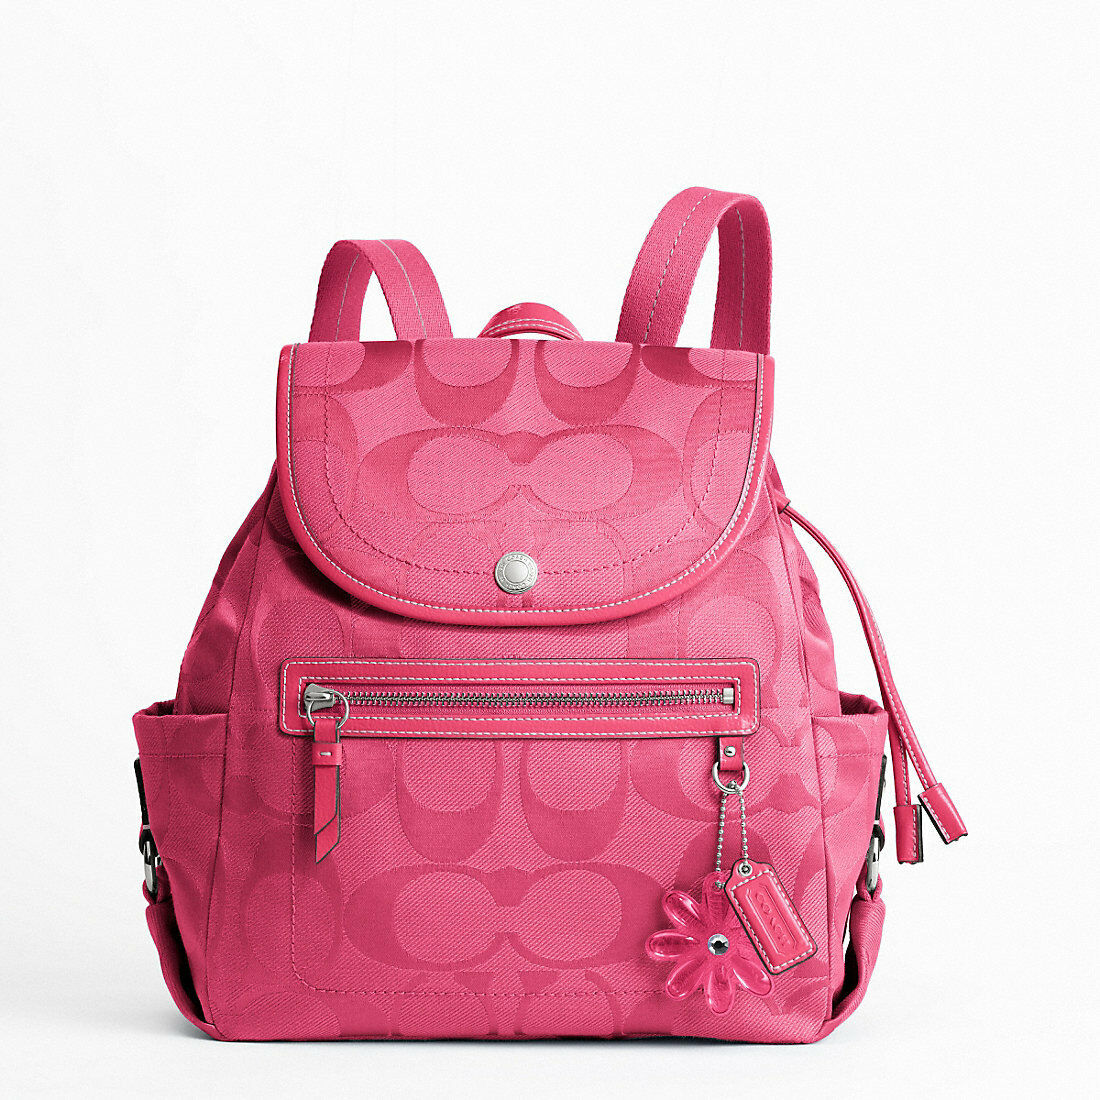 Are coach purses lifetime warranty